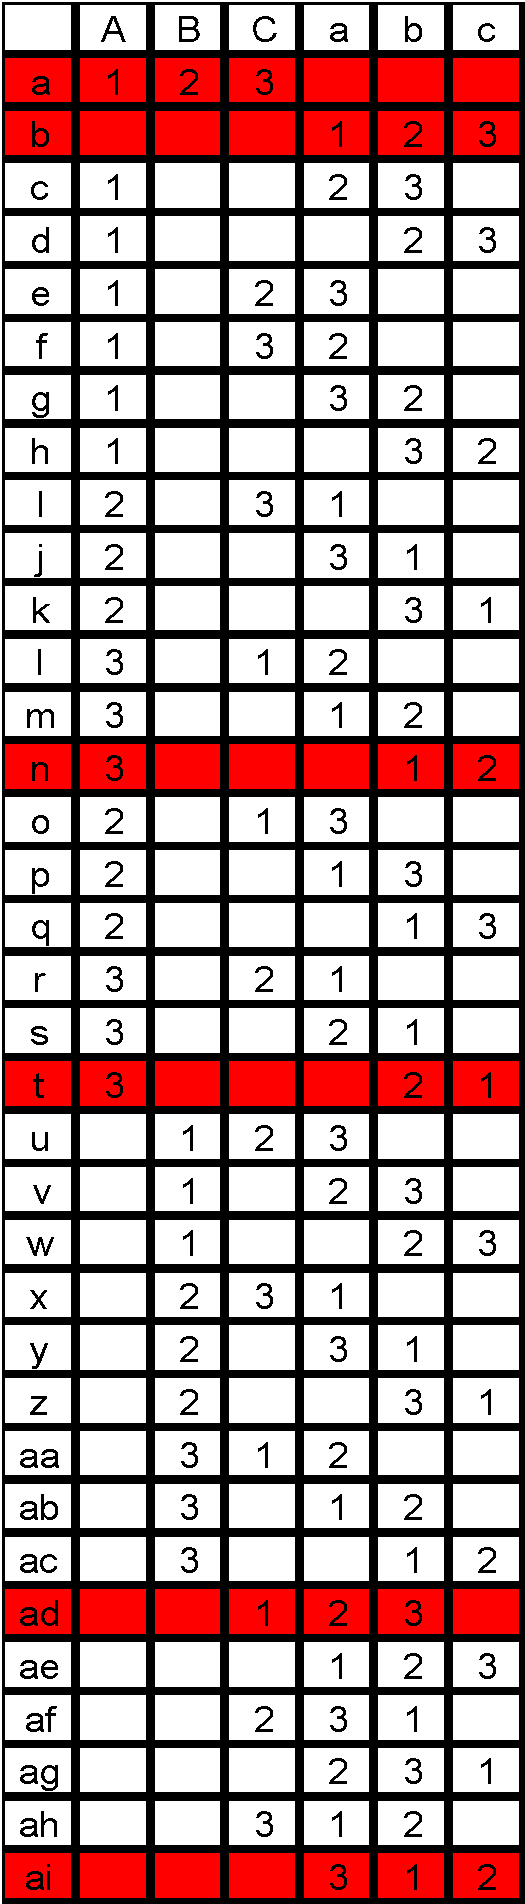 image06.png